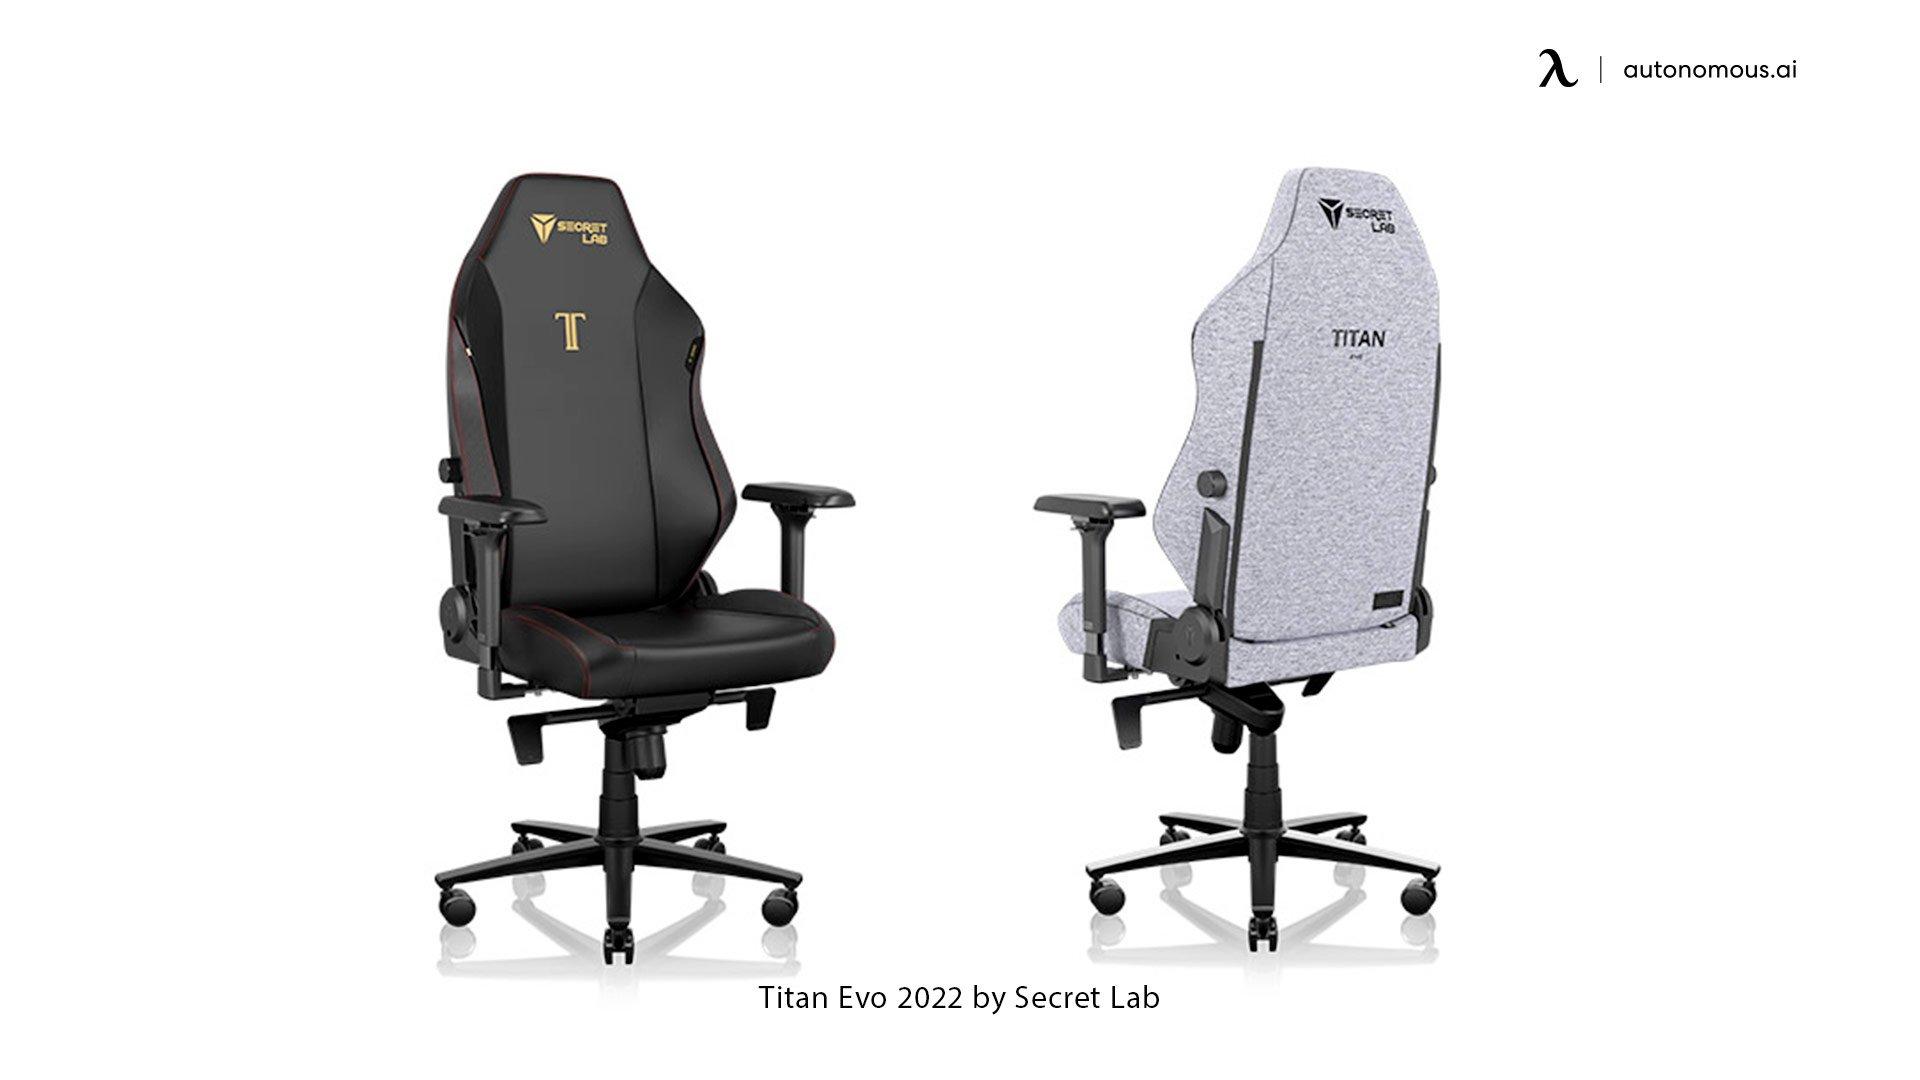 Titan Evo 2022 by Secret Lab